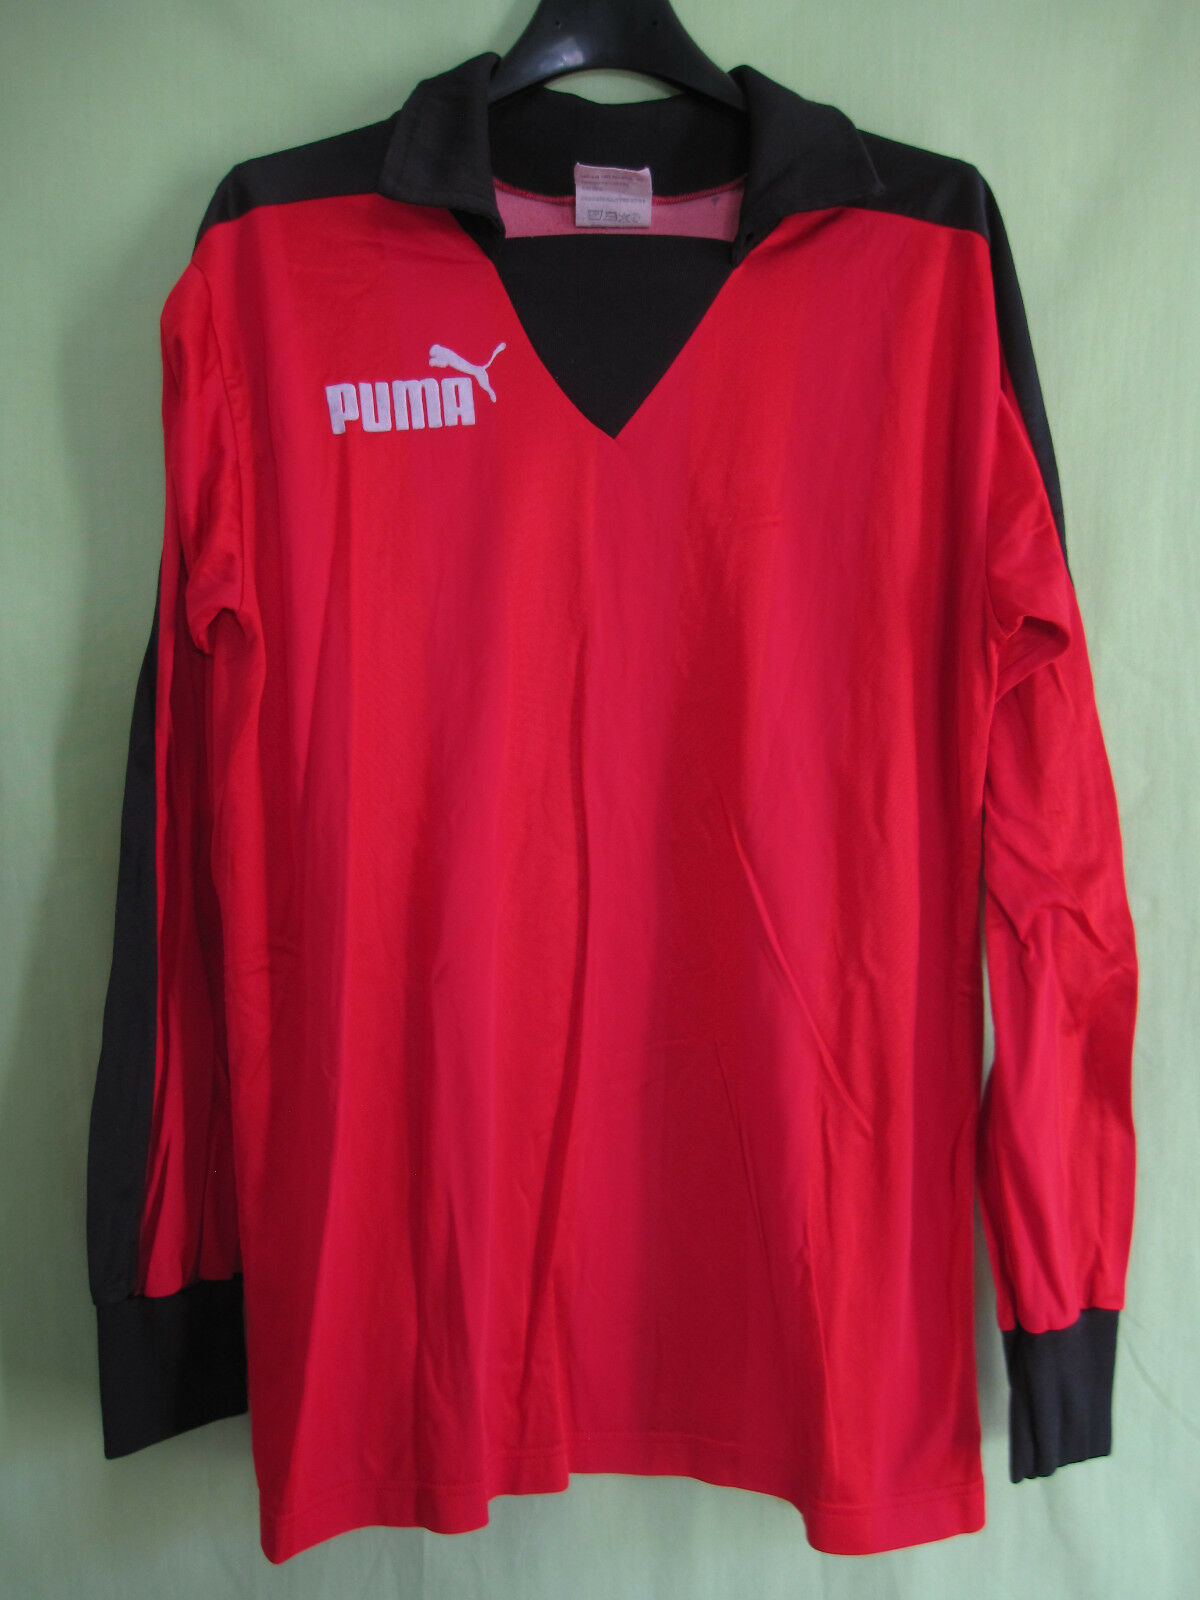 Maillot Stade Rennais Puma Rennes Vintage shirt Made in France Porté x 5